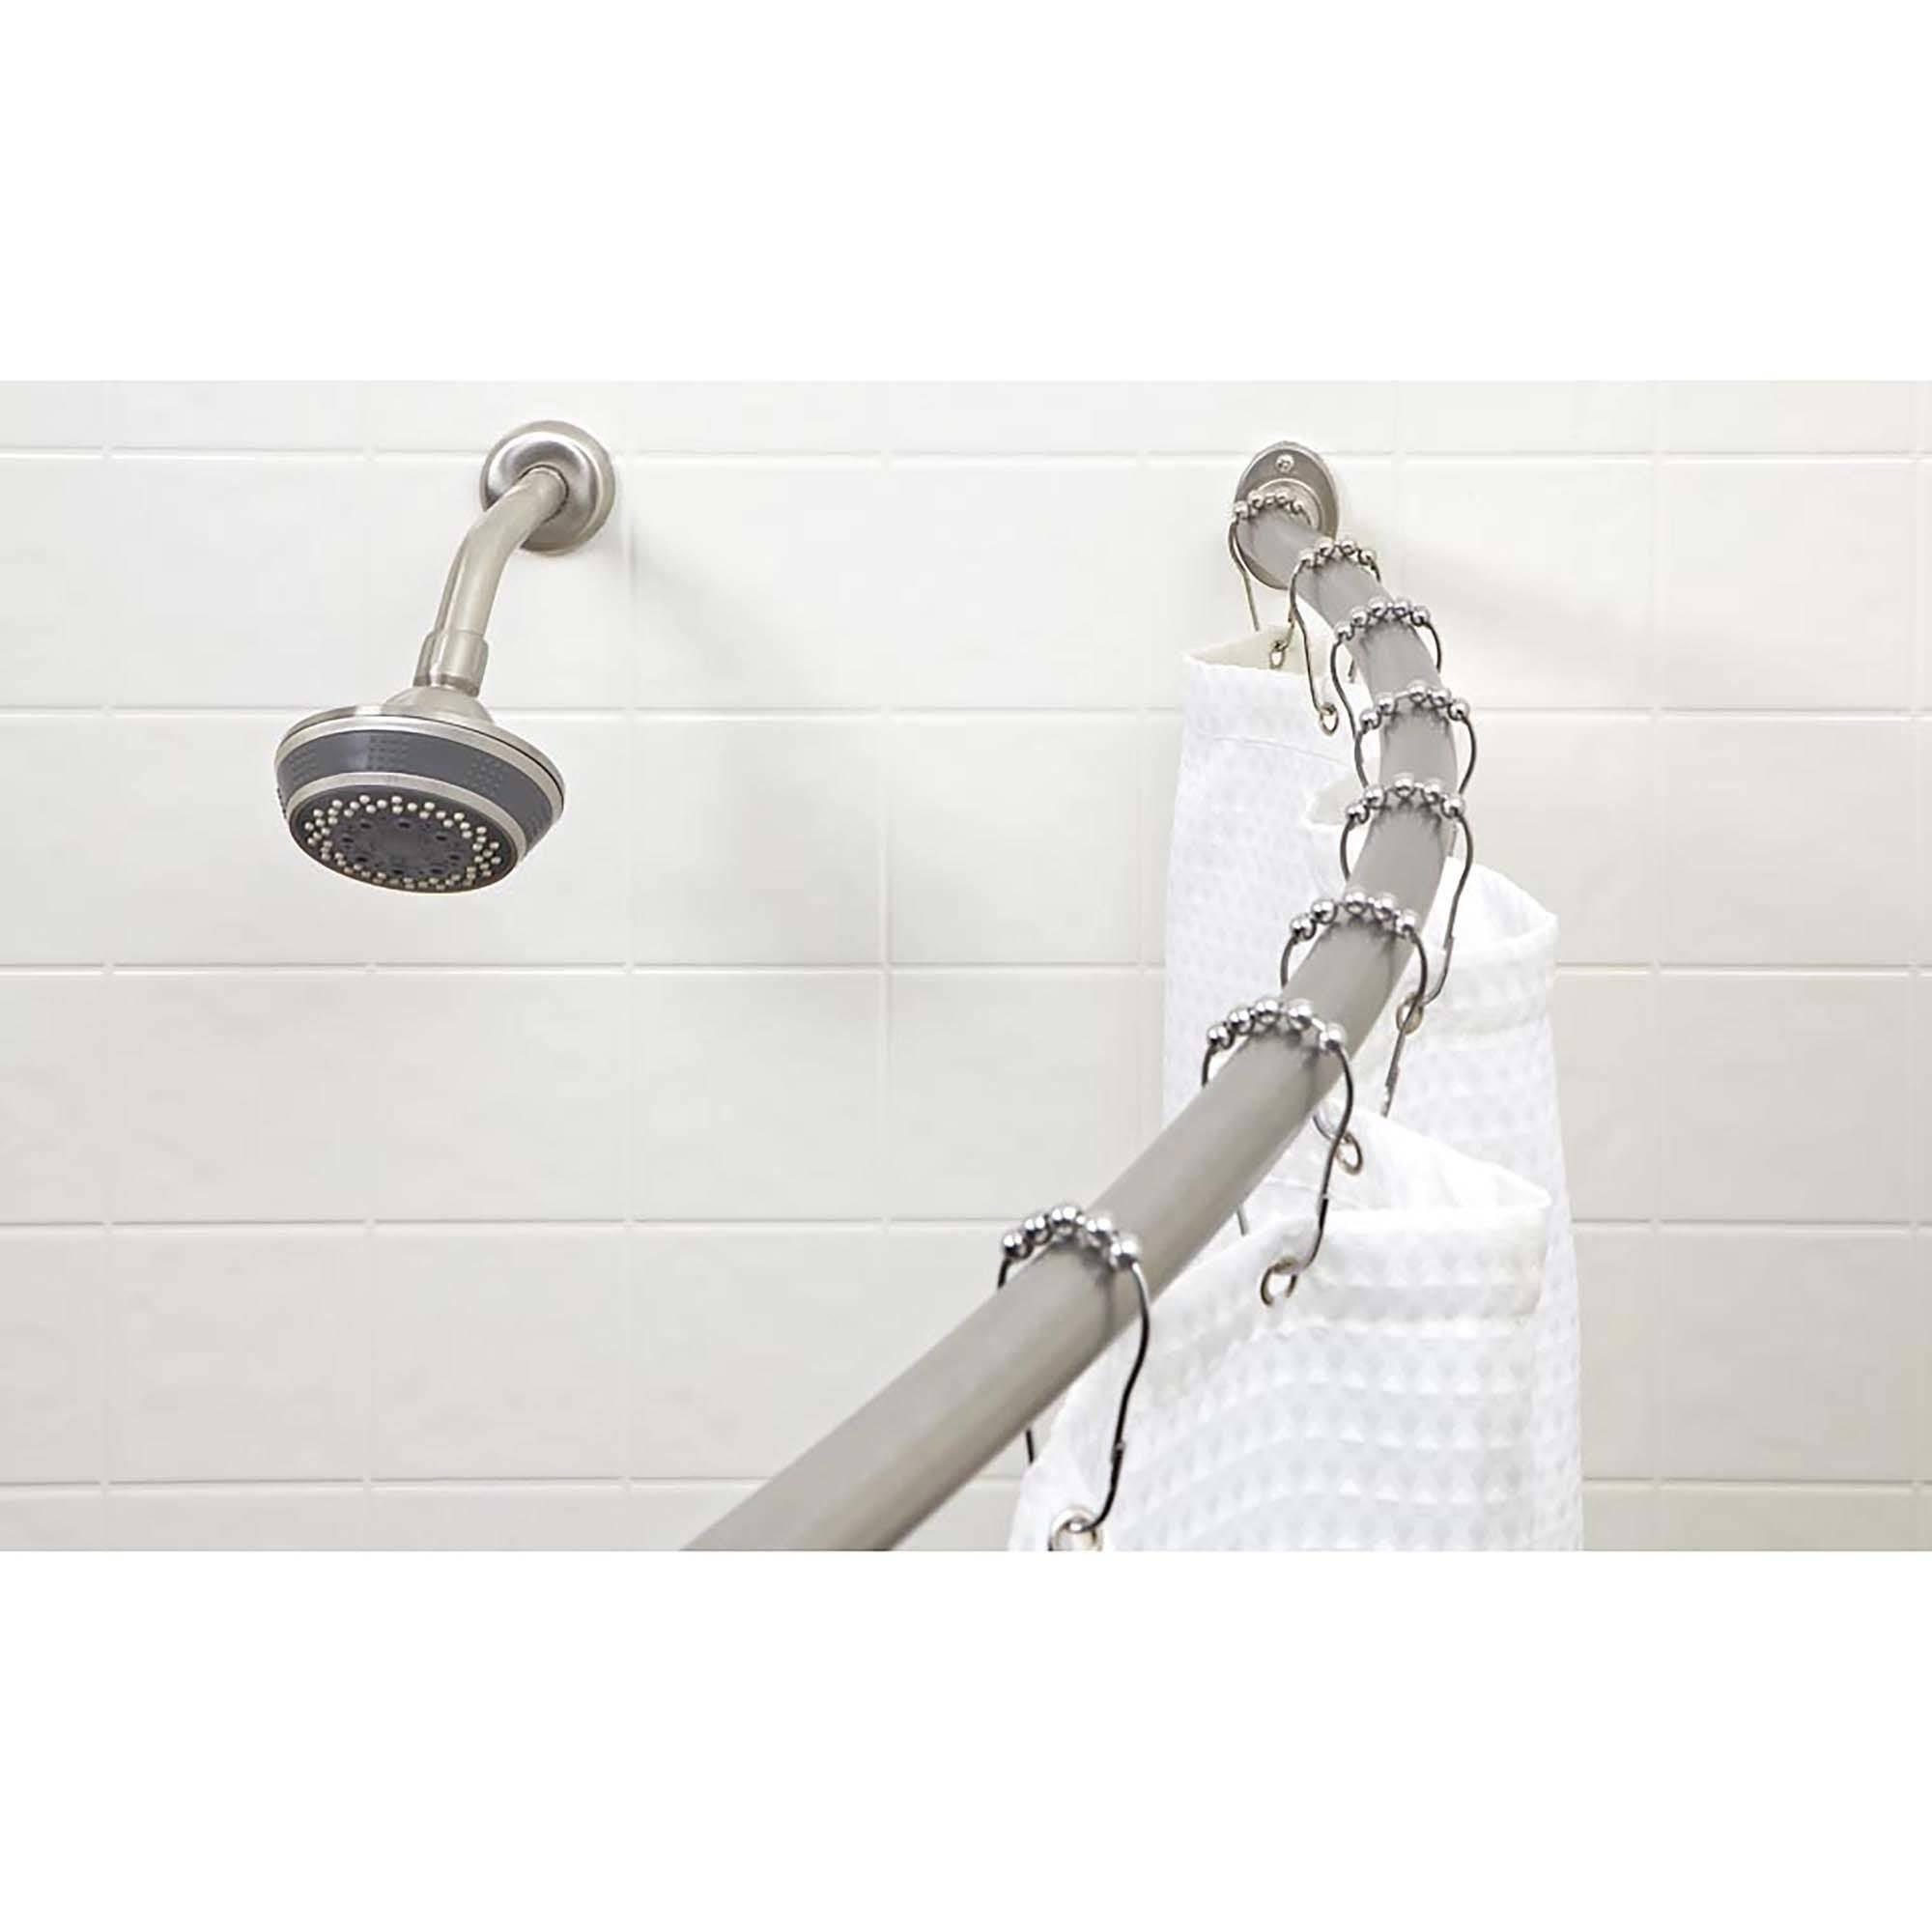 bath bliss curved shower rod satin nickel finish bath bliss curved shower curtain rod